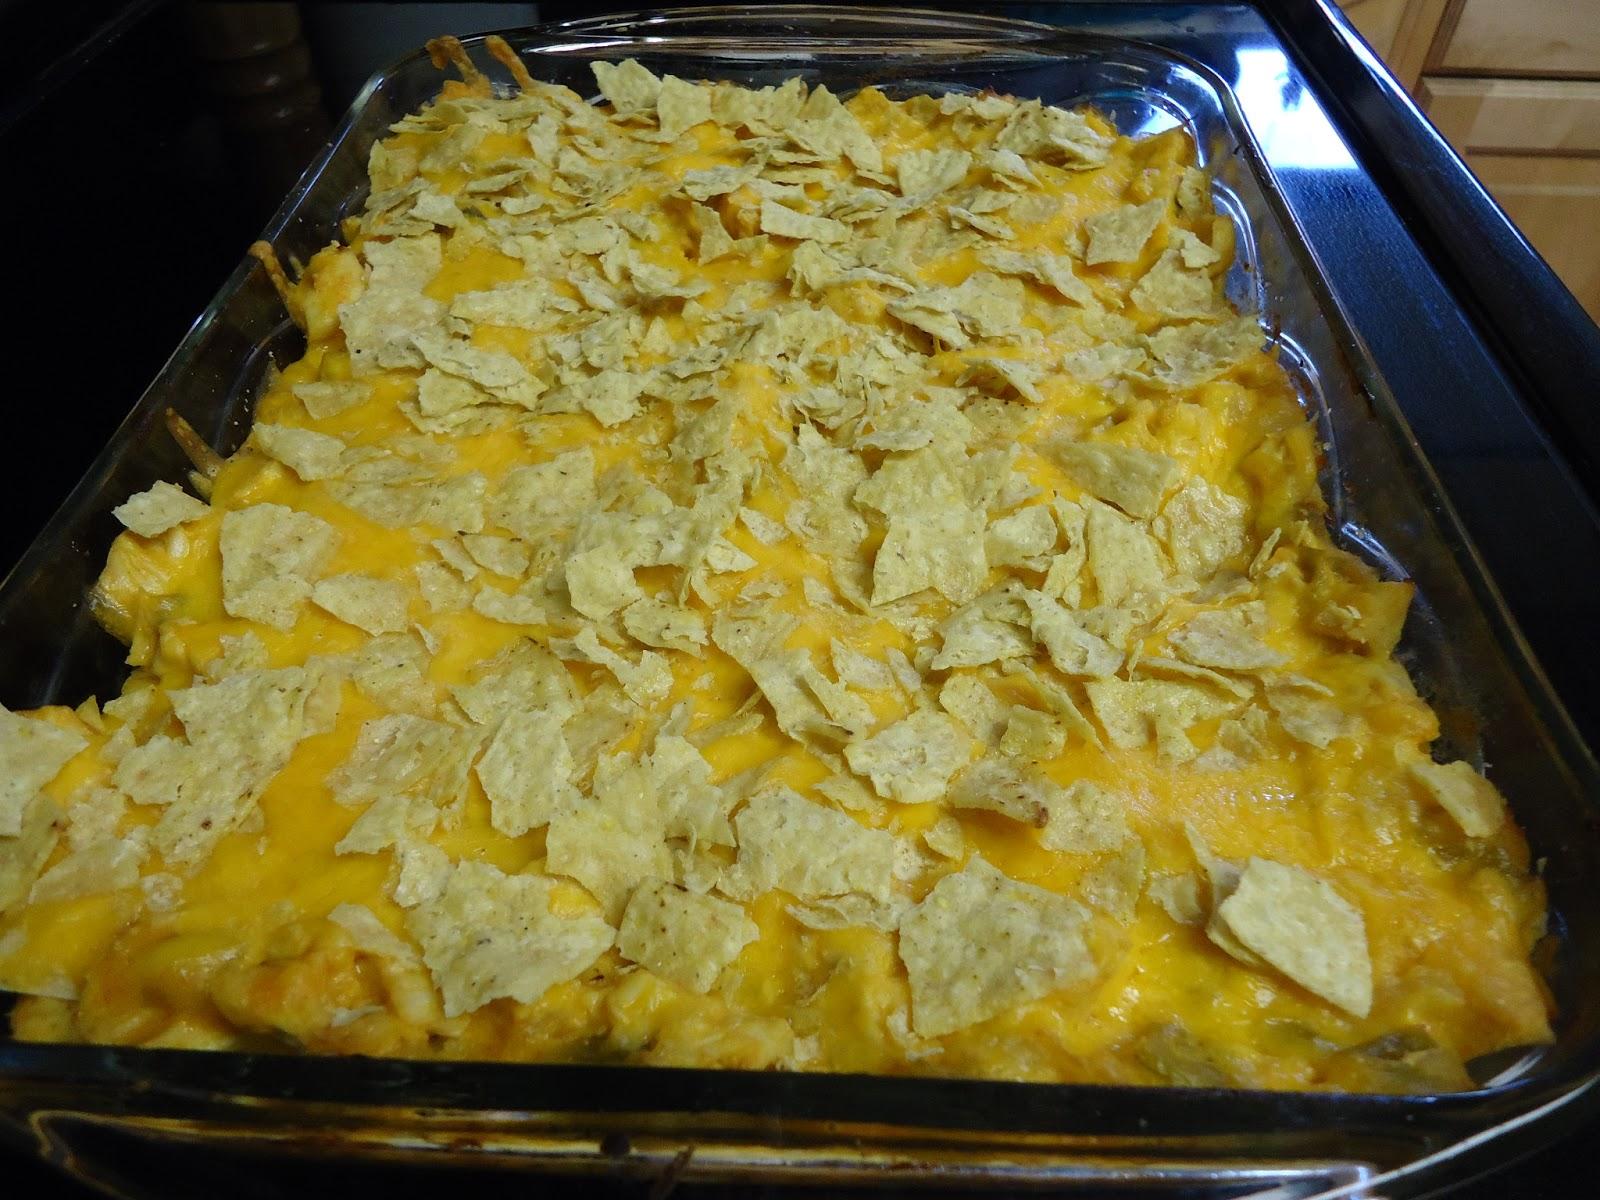 Mexican Chicken Casserole - Click link for recipe.